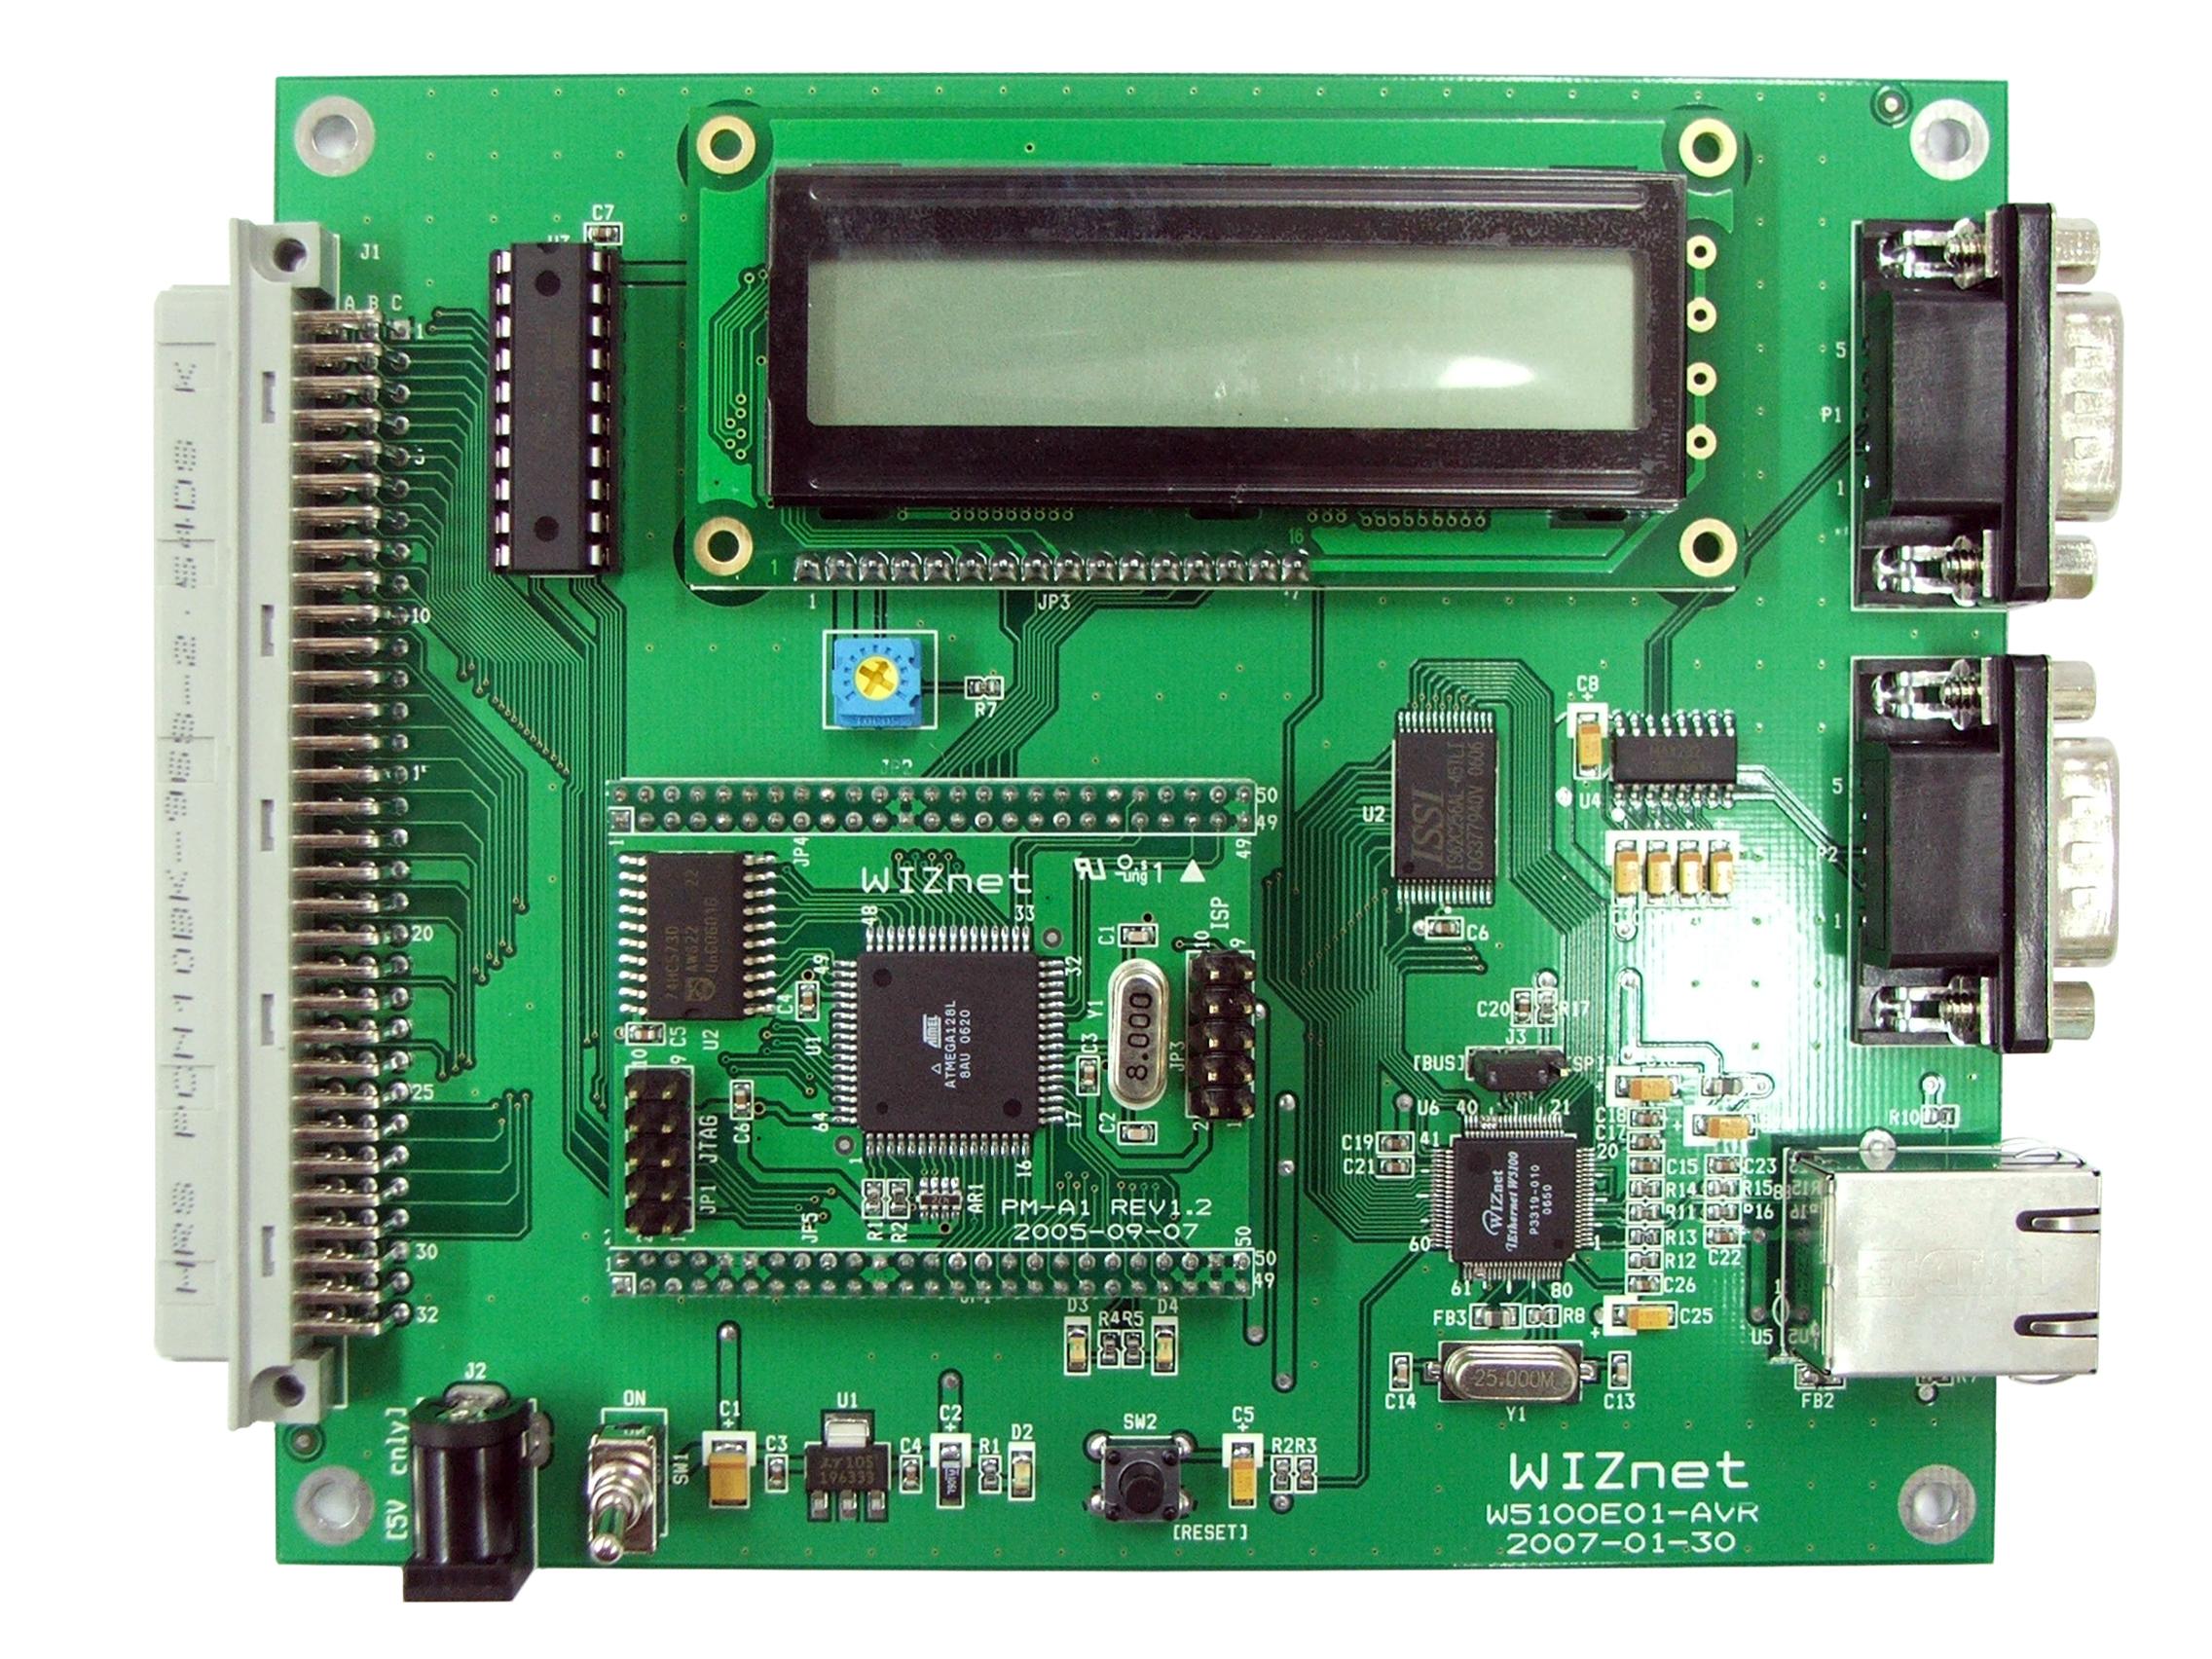 W5100E01-AVR | WIZnet Co , Ltd